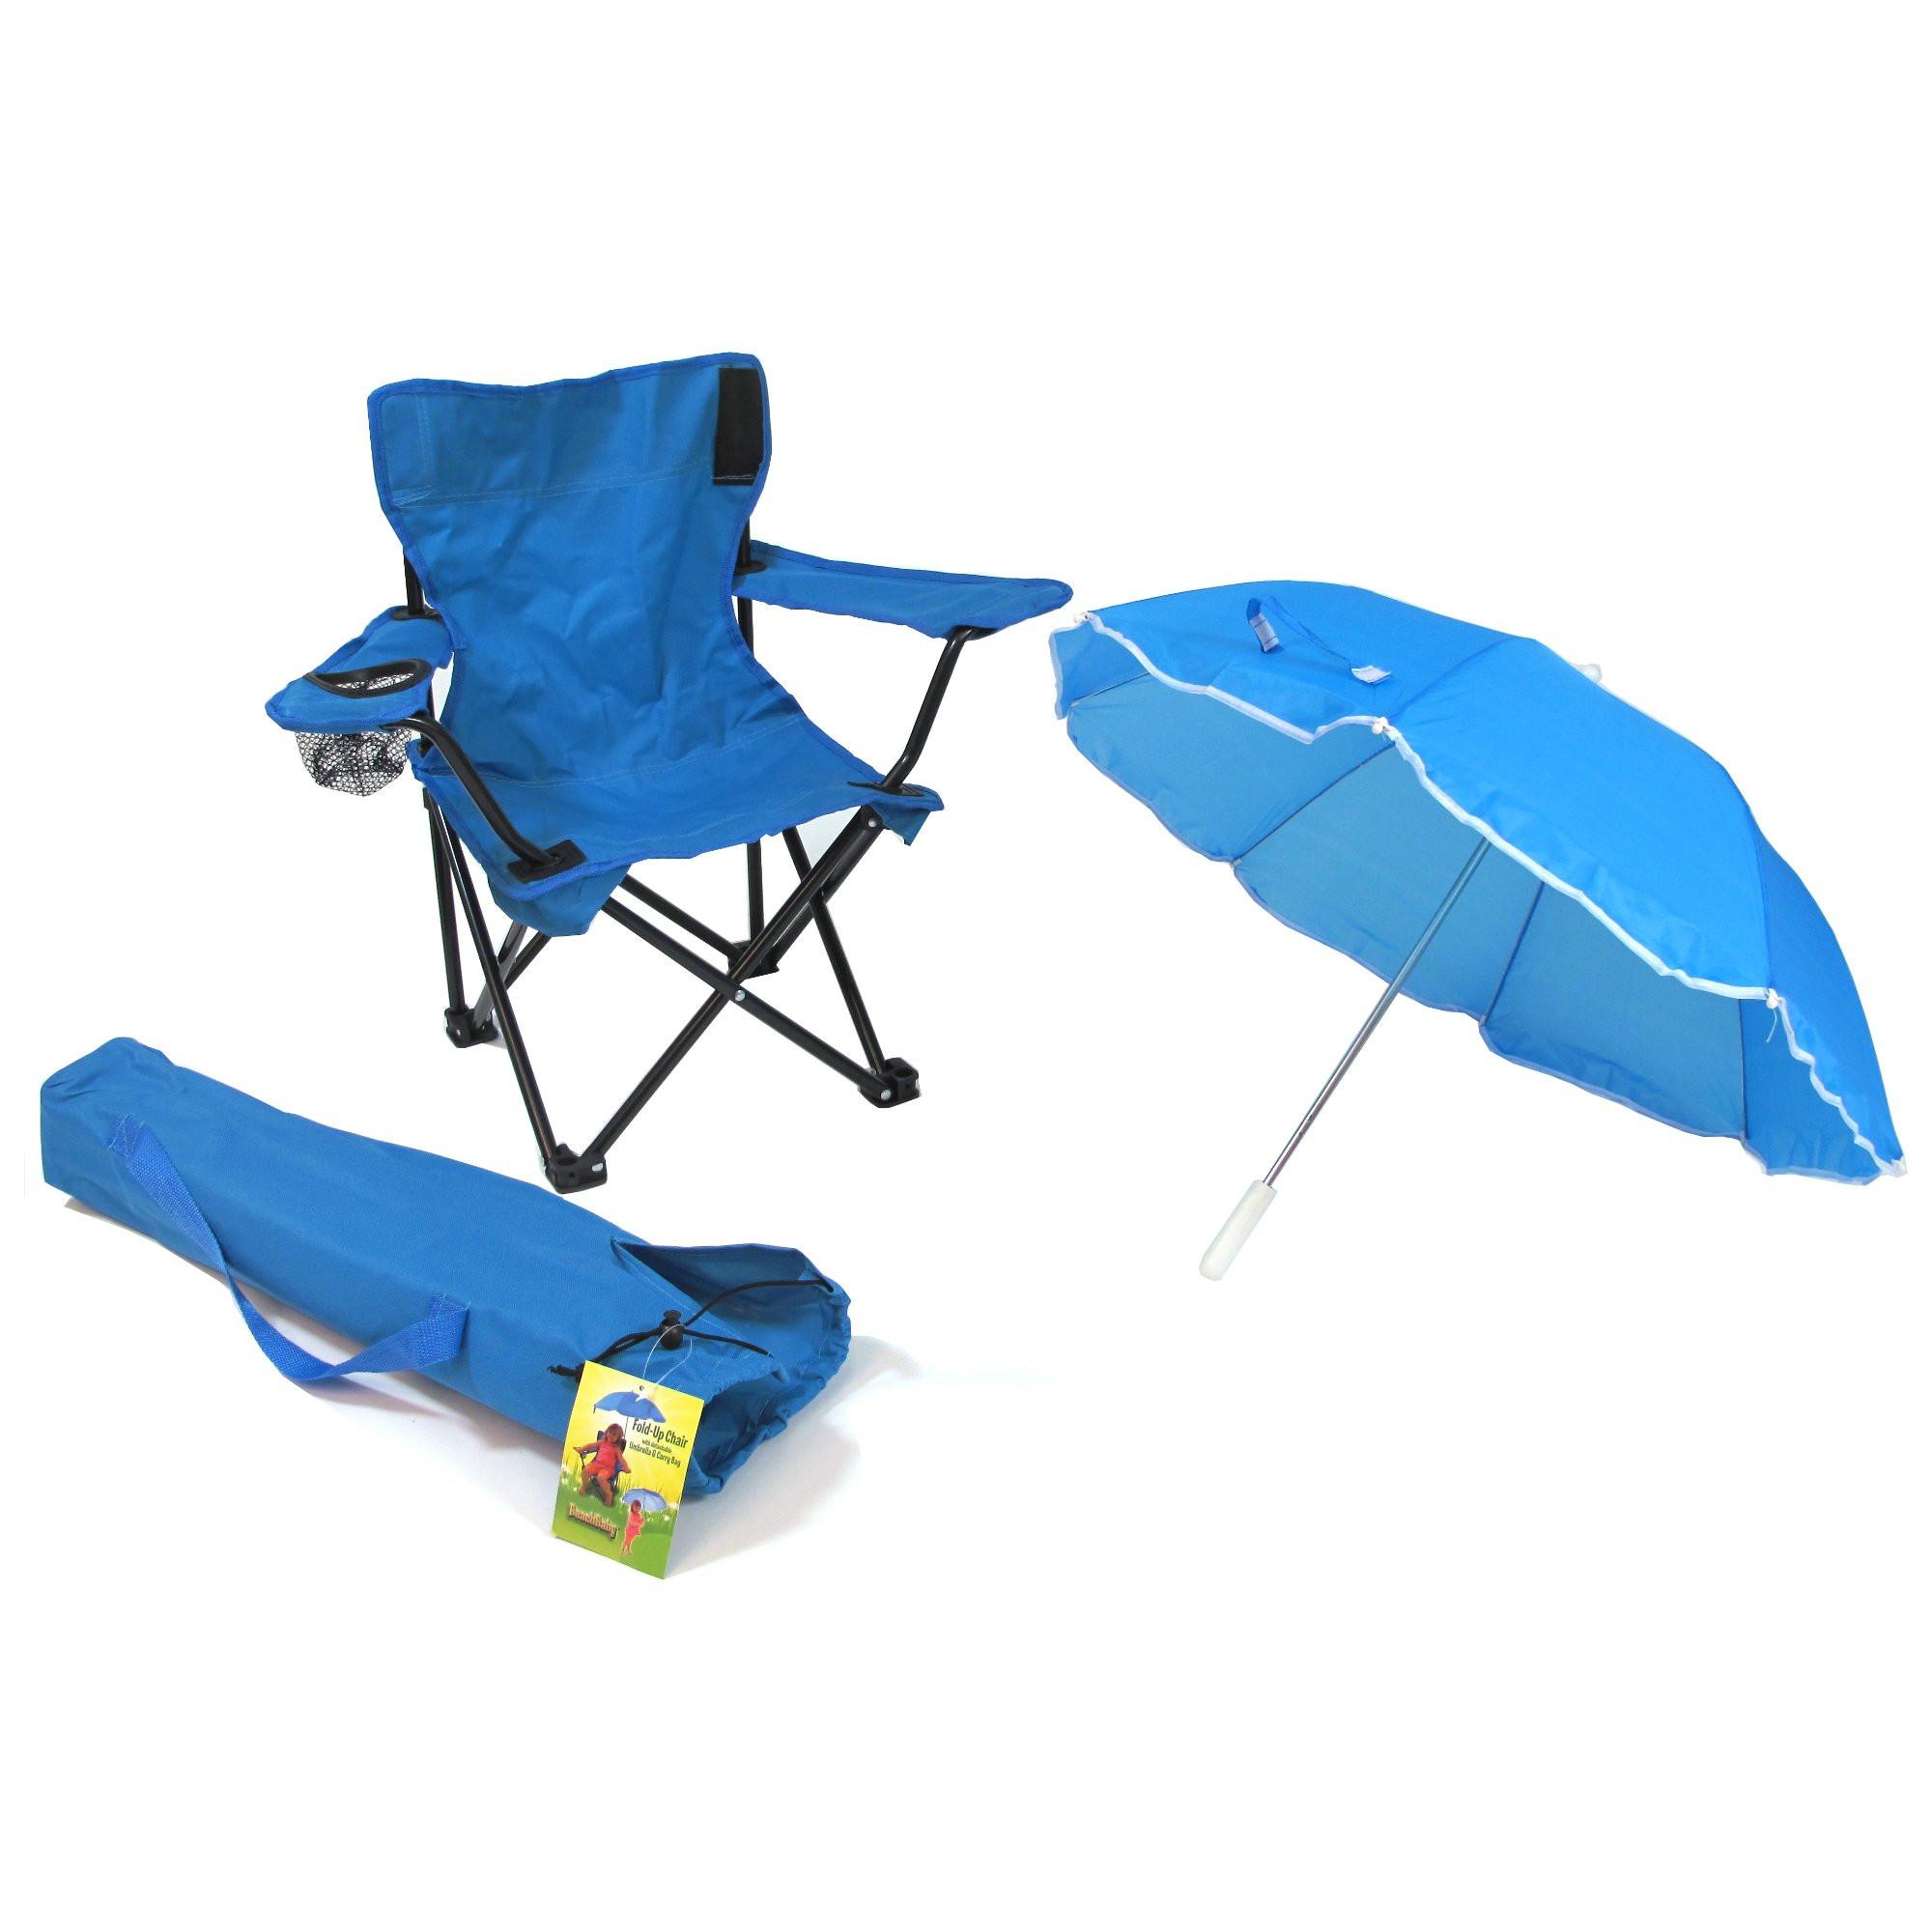 Kids Beach Chair With Umbrella  Portable Outdoor Kids Beach Camping Folding Chair with